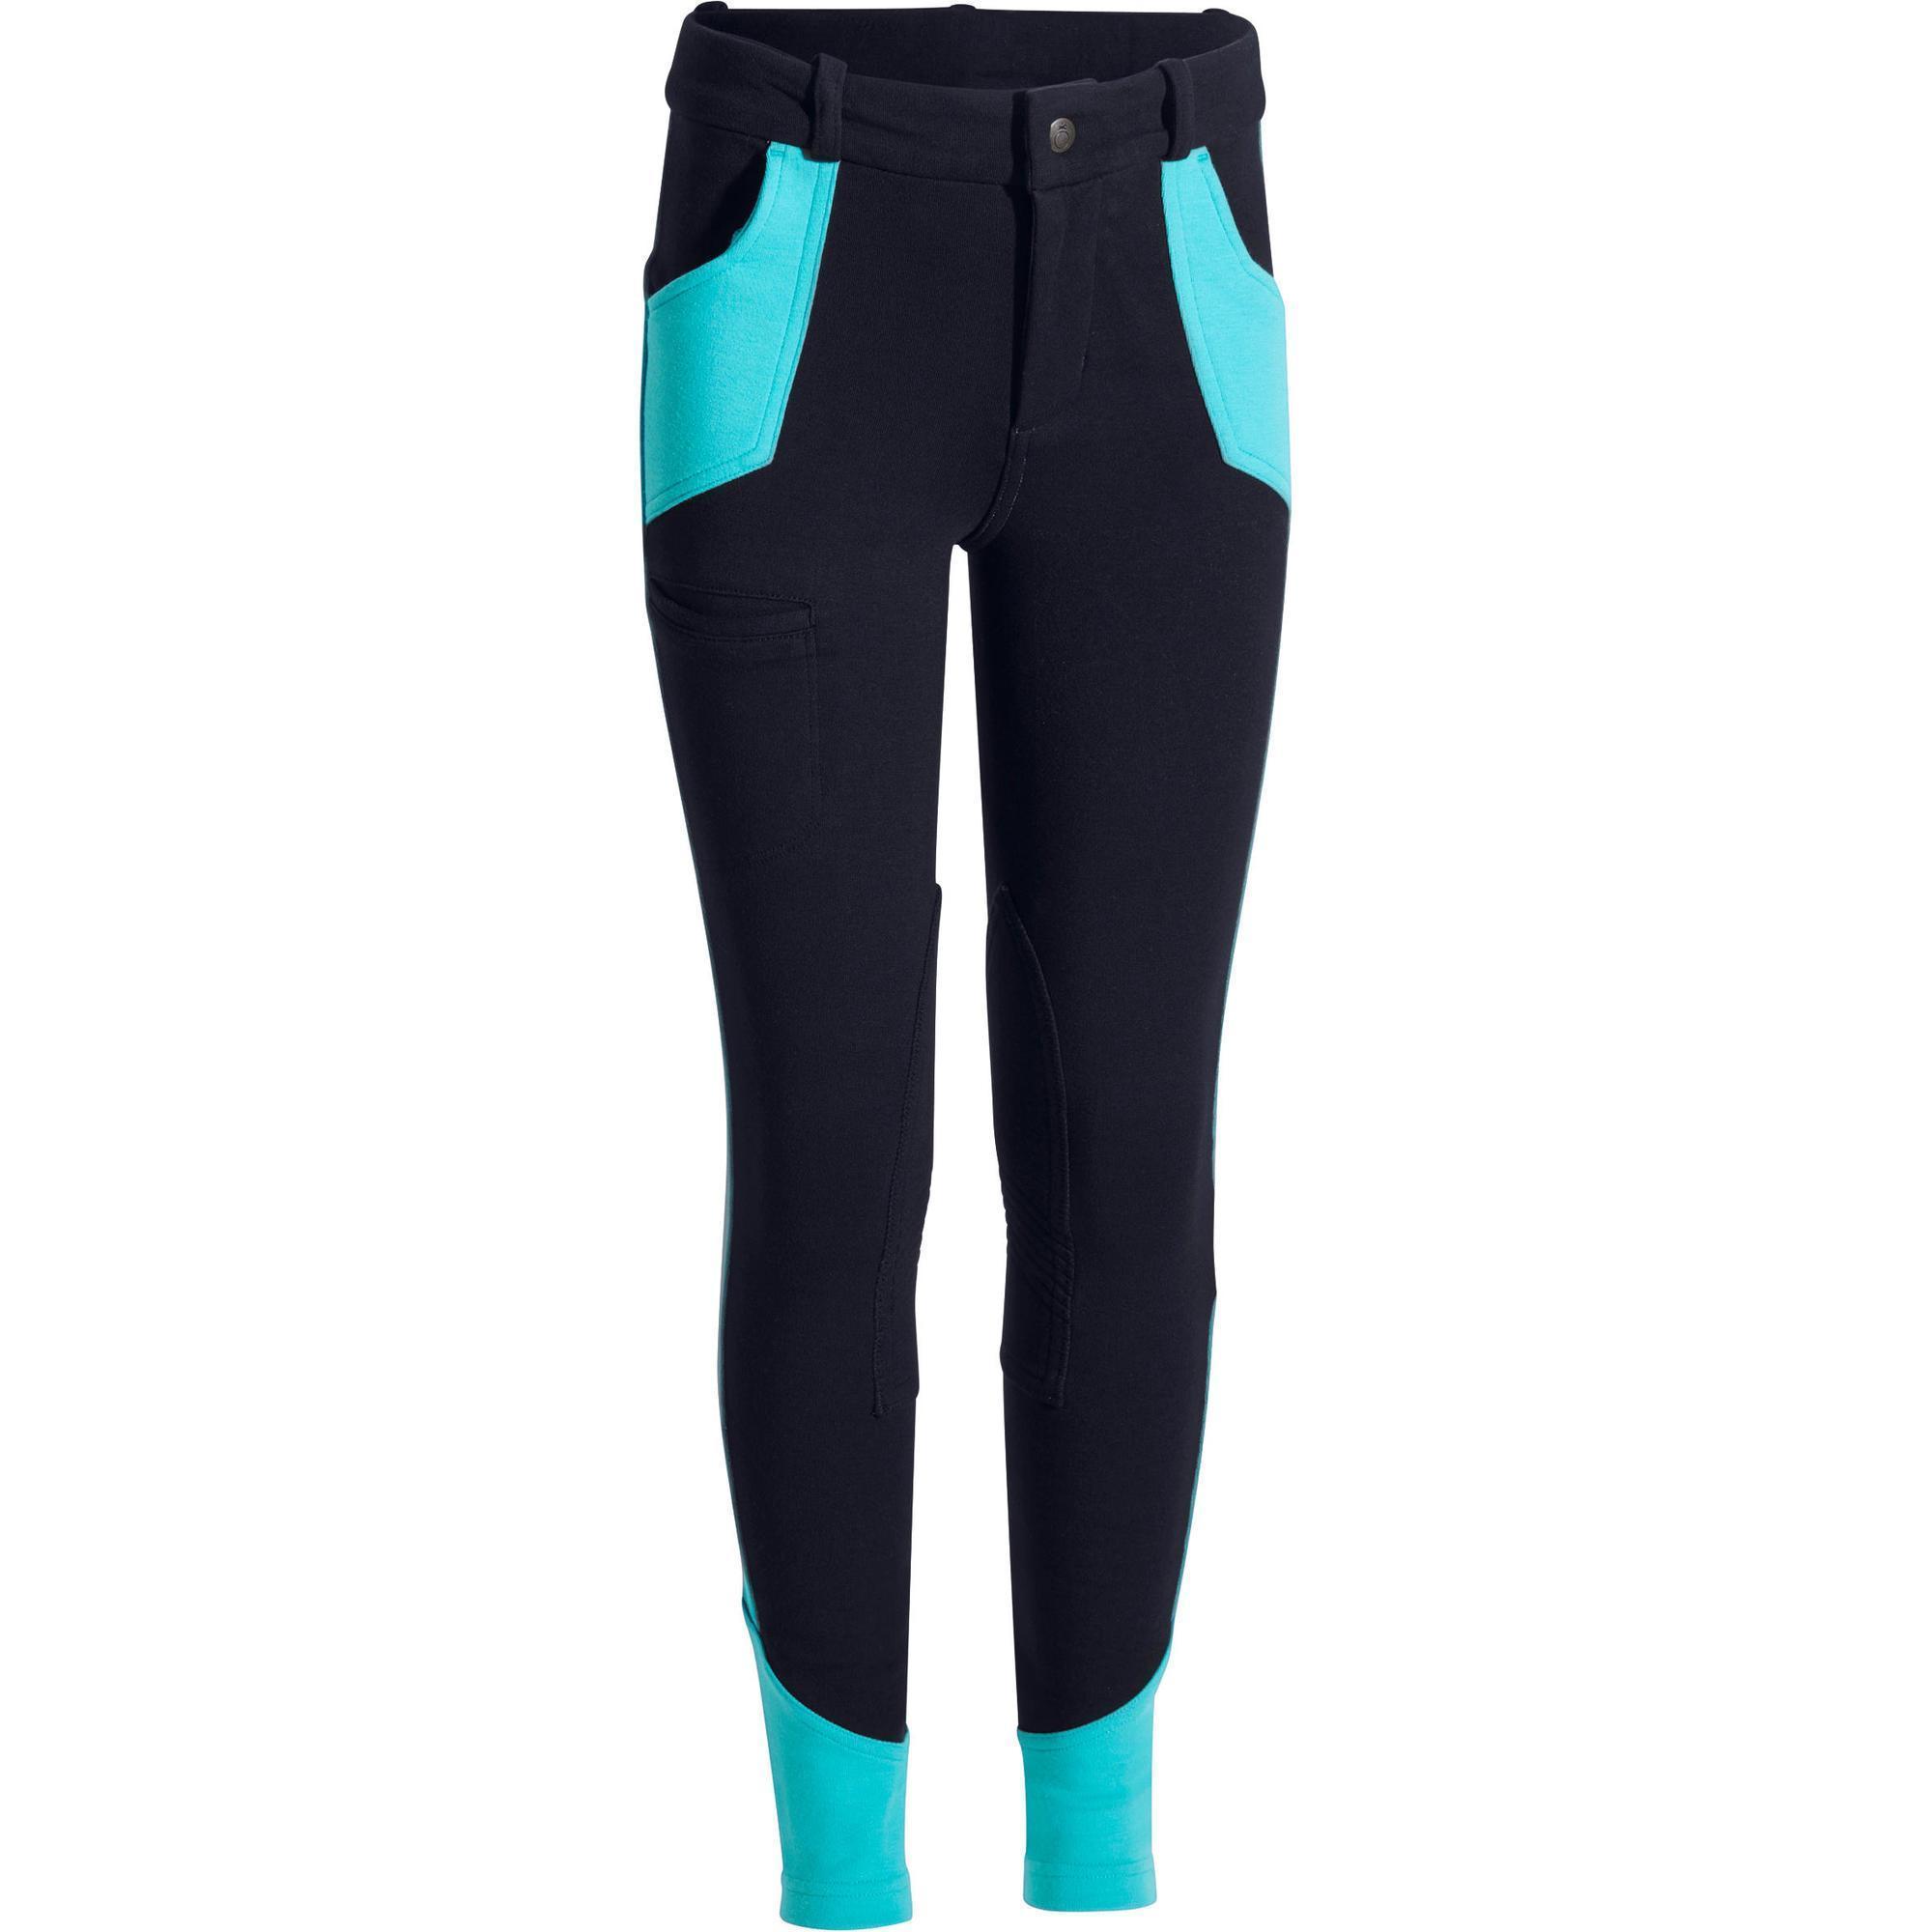 pantalon quitation enfant bicolo bleu marine bleu turquoise fouganza. Black Bedroom Furniture Sets. Home Design Ideas